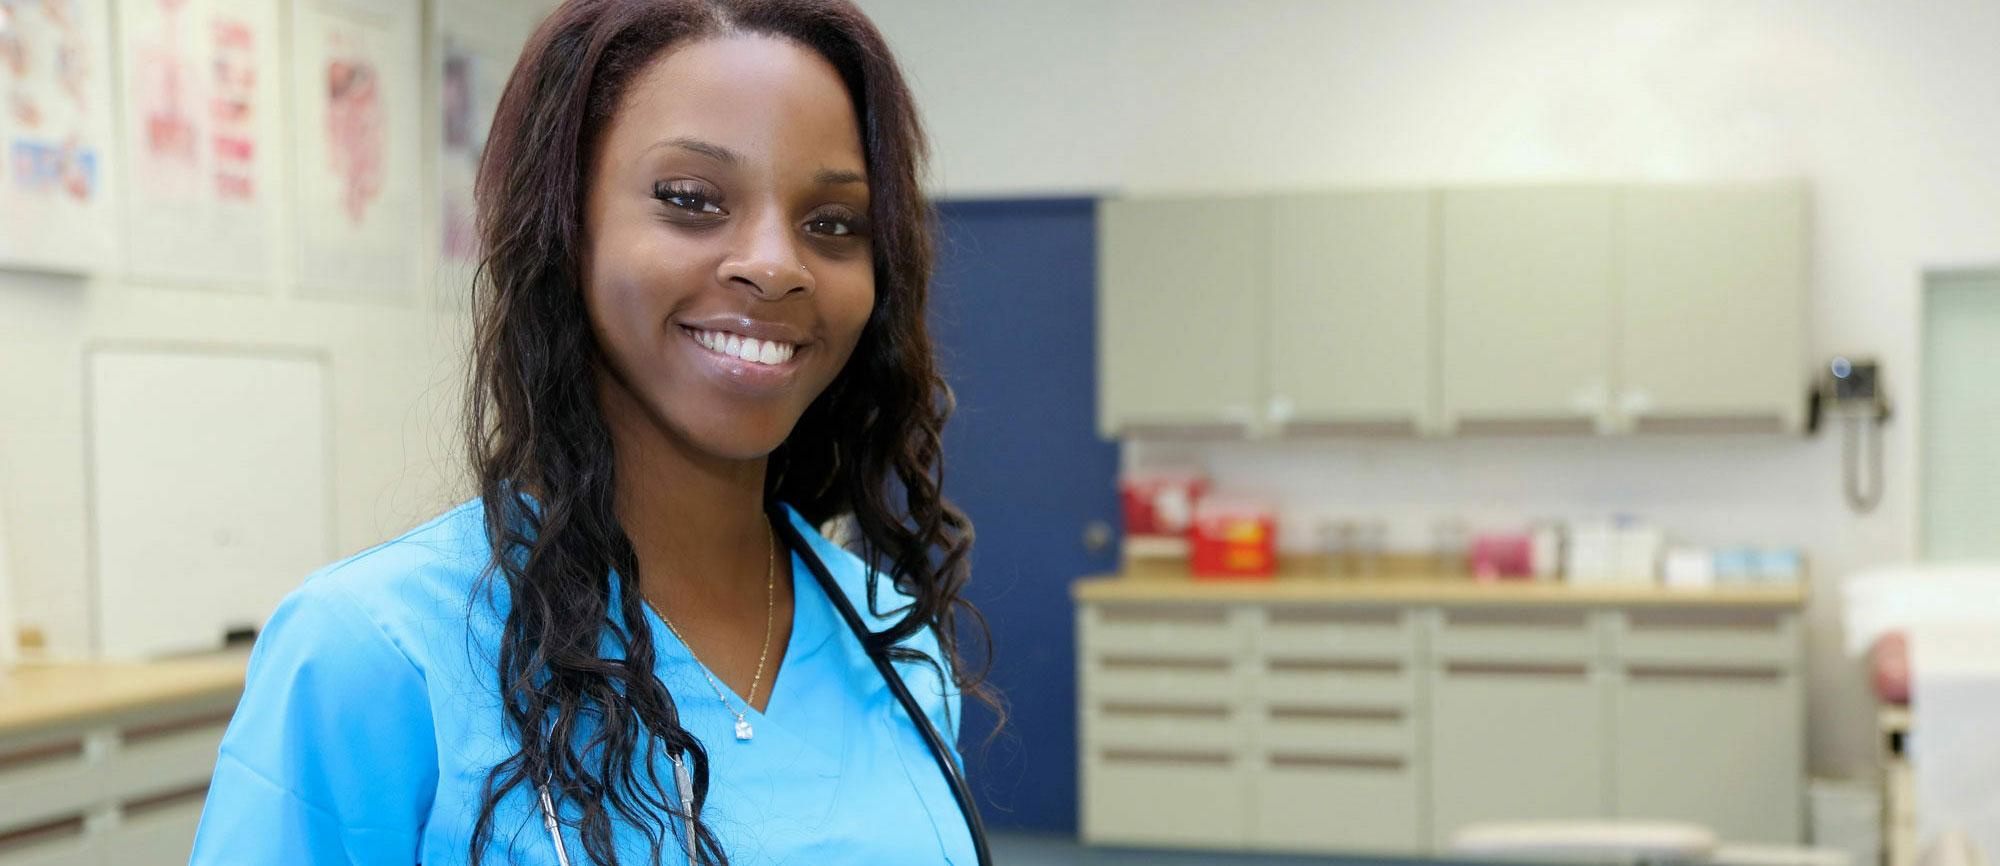 Medical Assistant Image - Larock Healthcare Academy - Healthcare Career Training